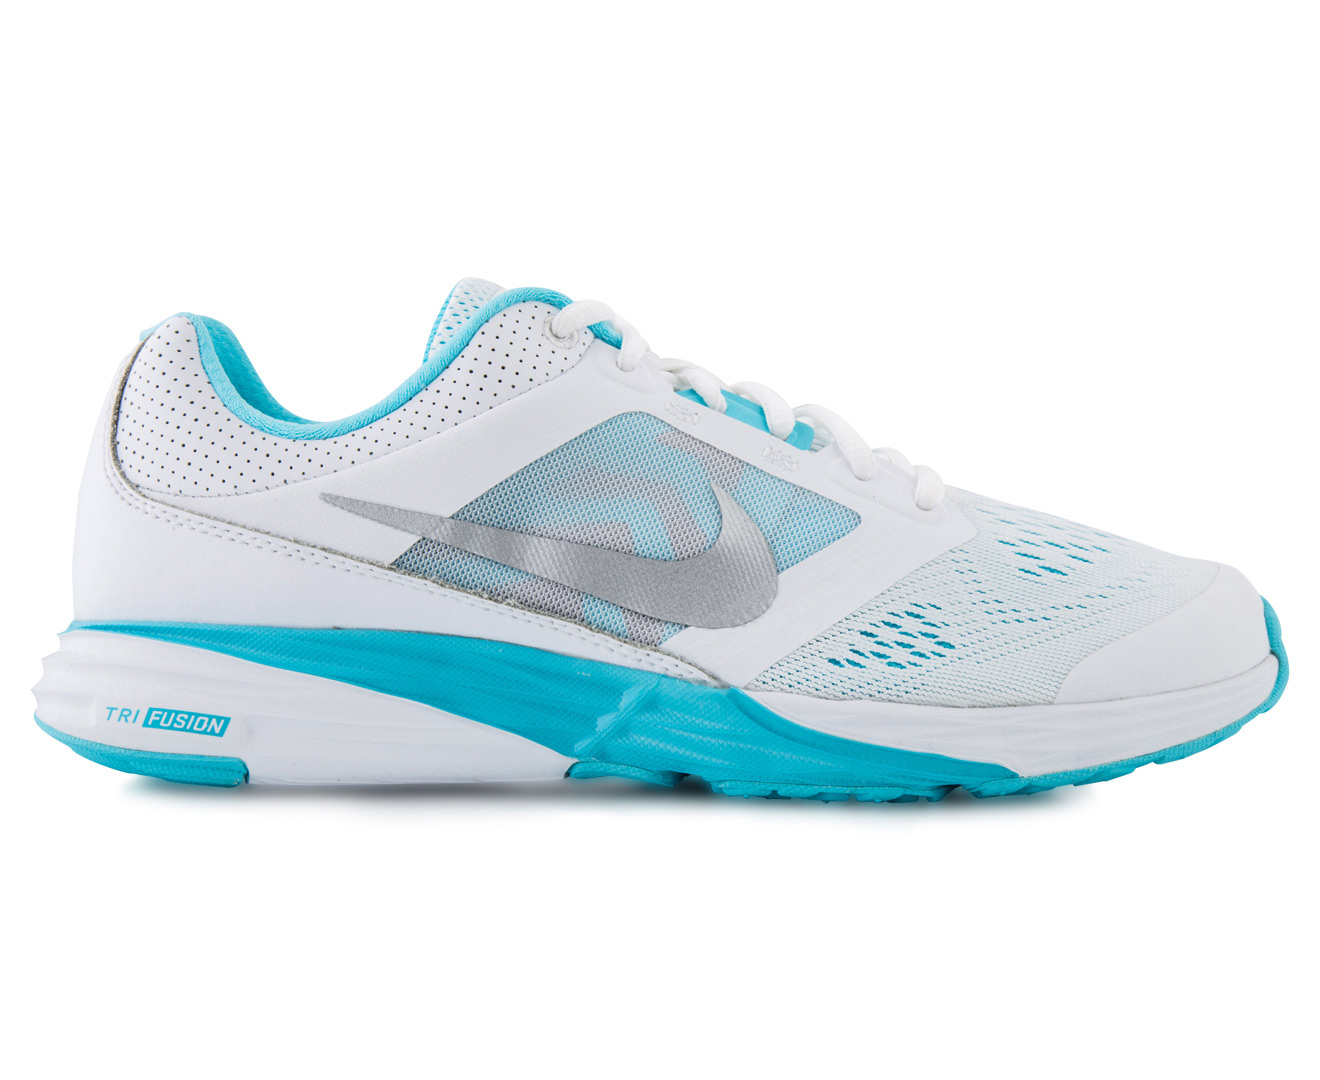 Nike Tri Fusion Run Women's Shoe - White/Metallic Silver/Blue | Great daily  deals at Australia's favourite superstore | Catch.com.au